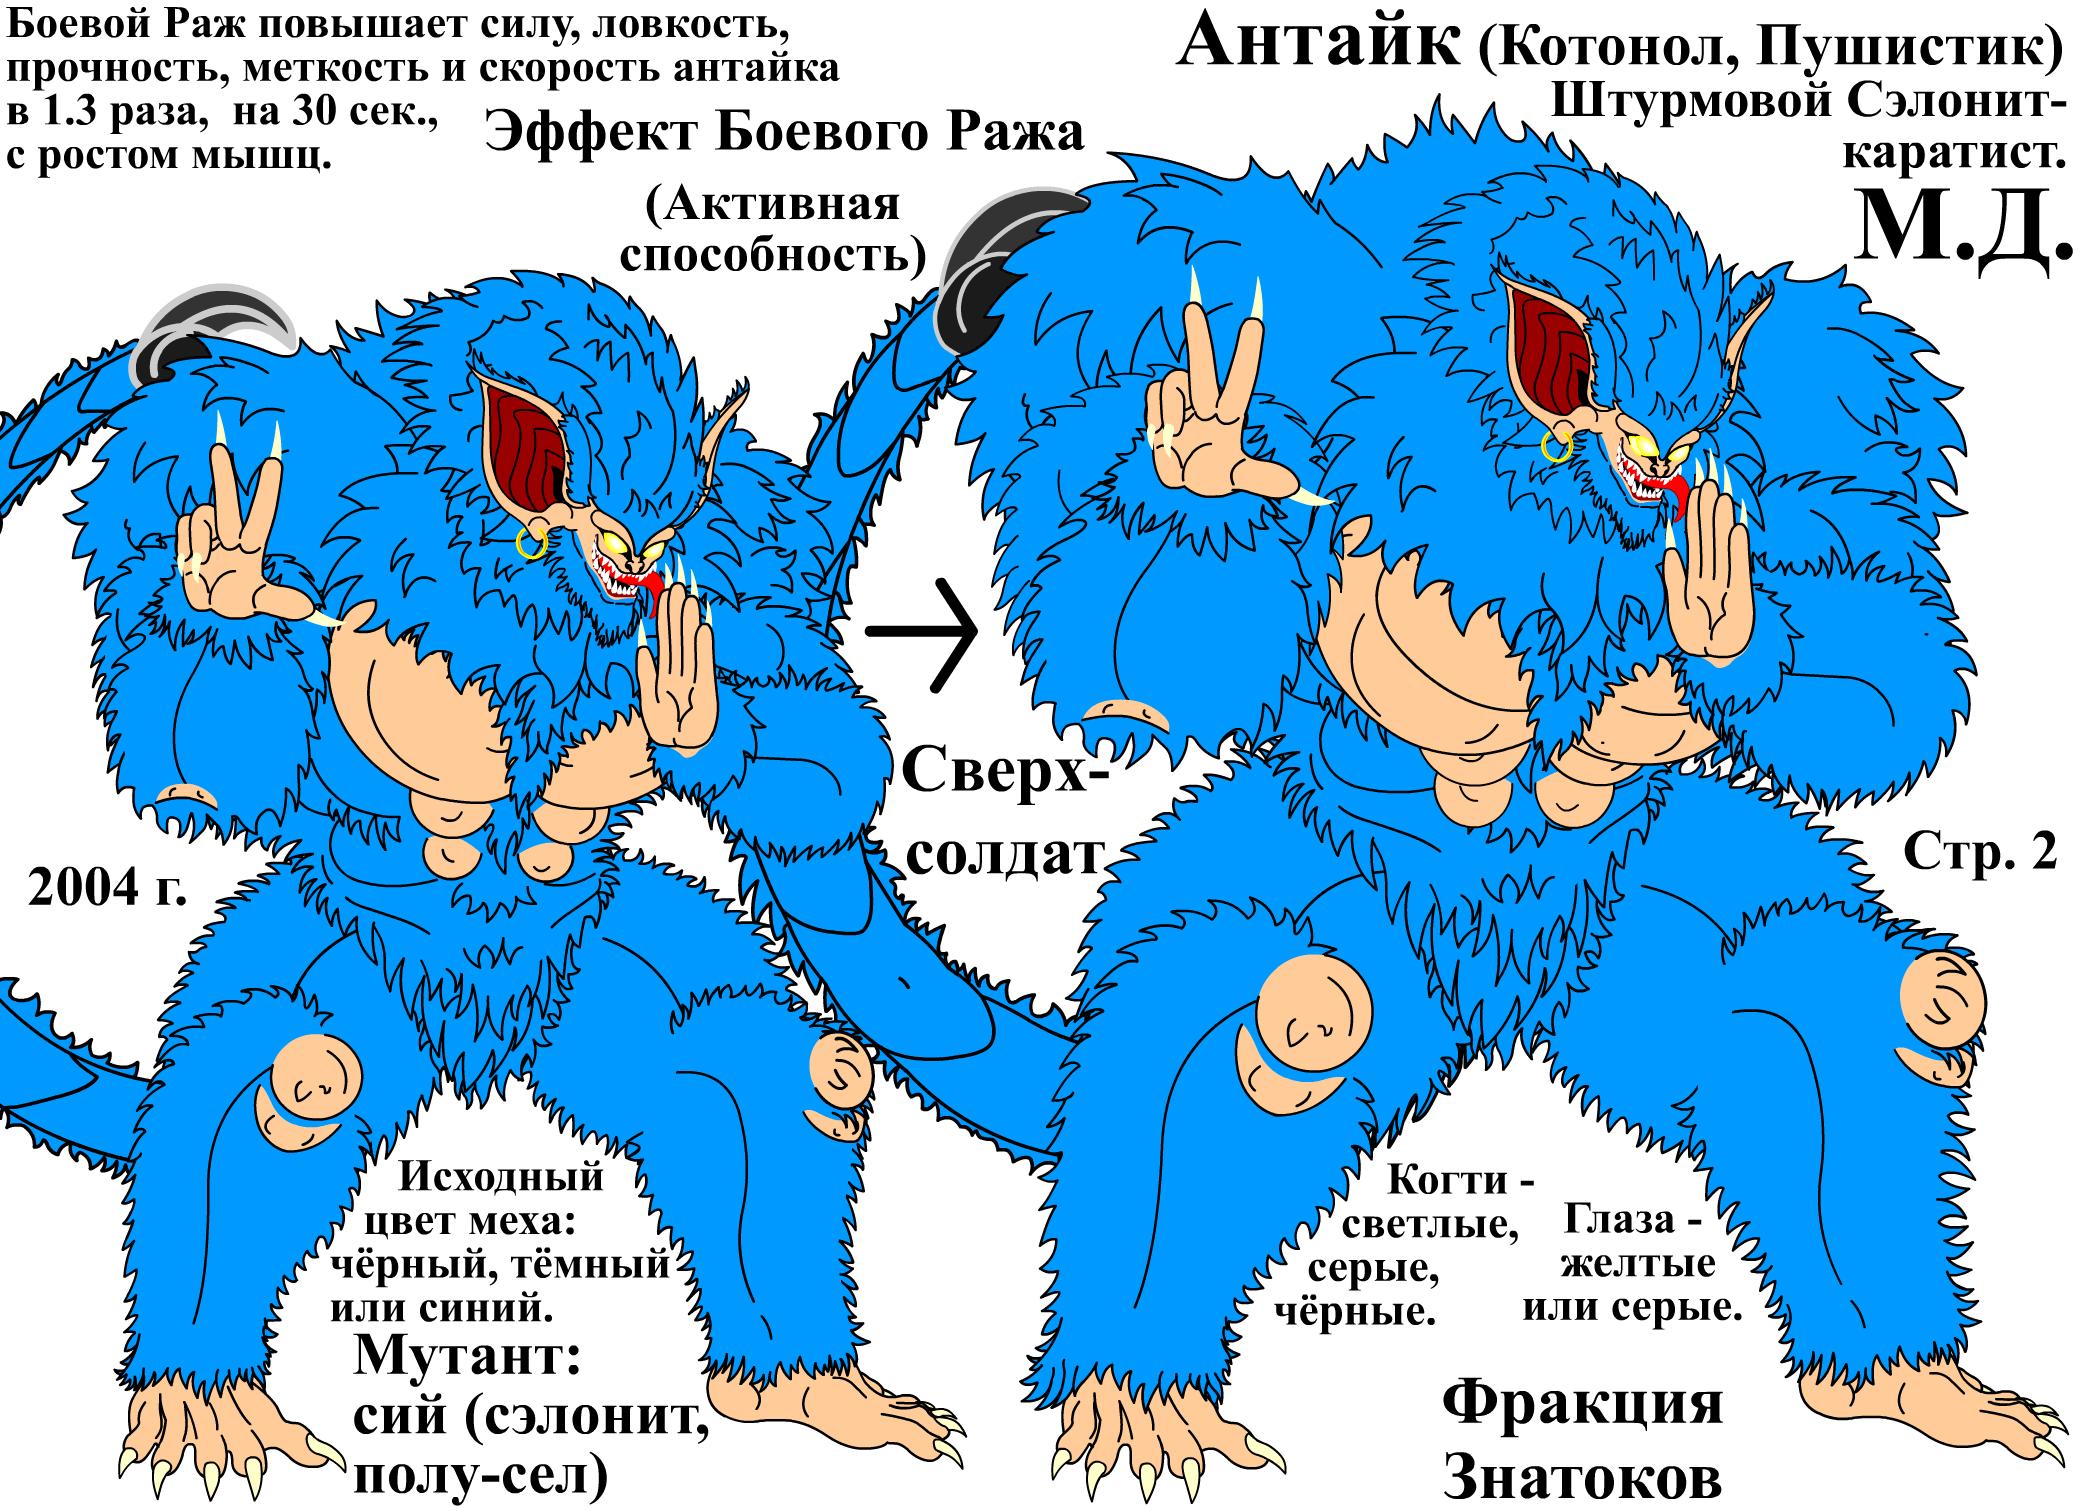 https://xgm.guru/p/blog-agren/xroniki-groev-chas-cyda-glava-cemi